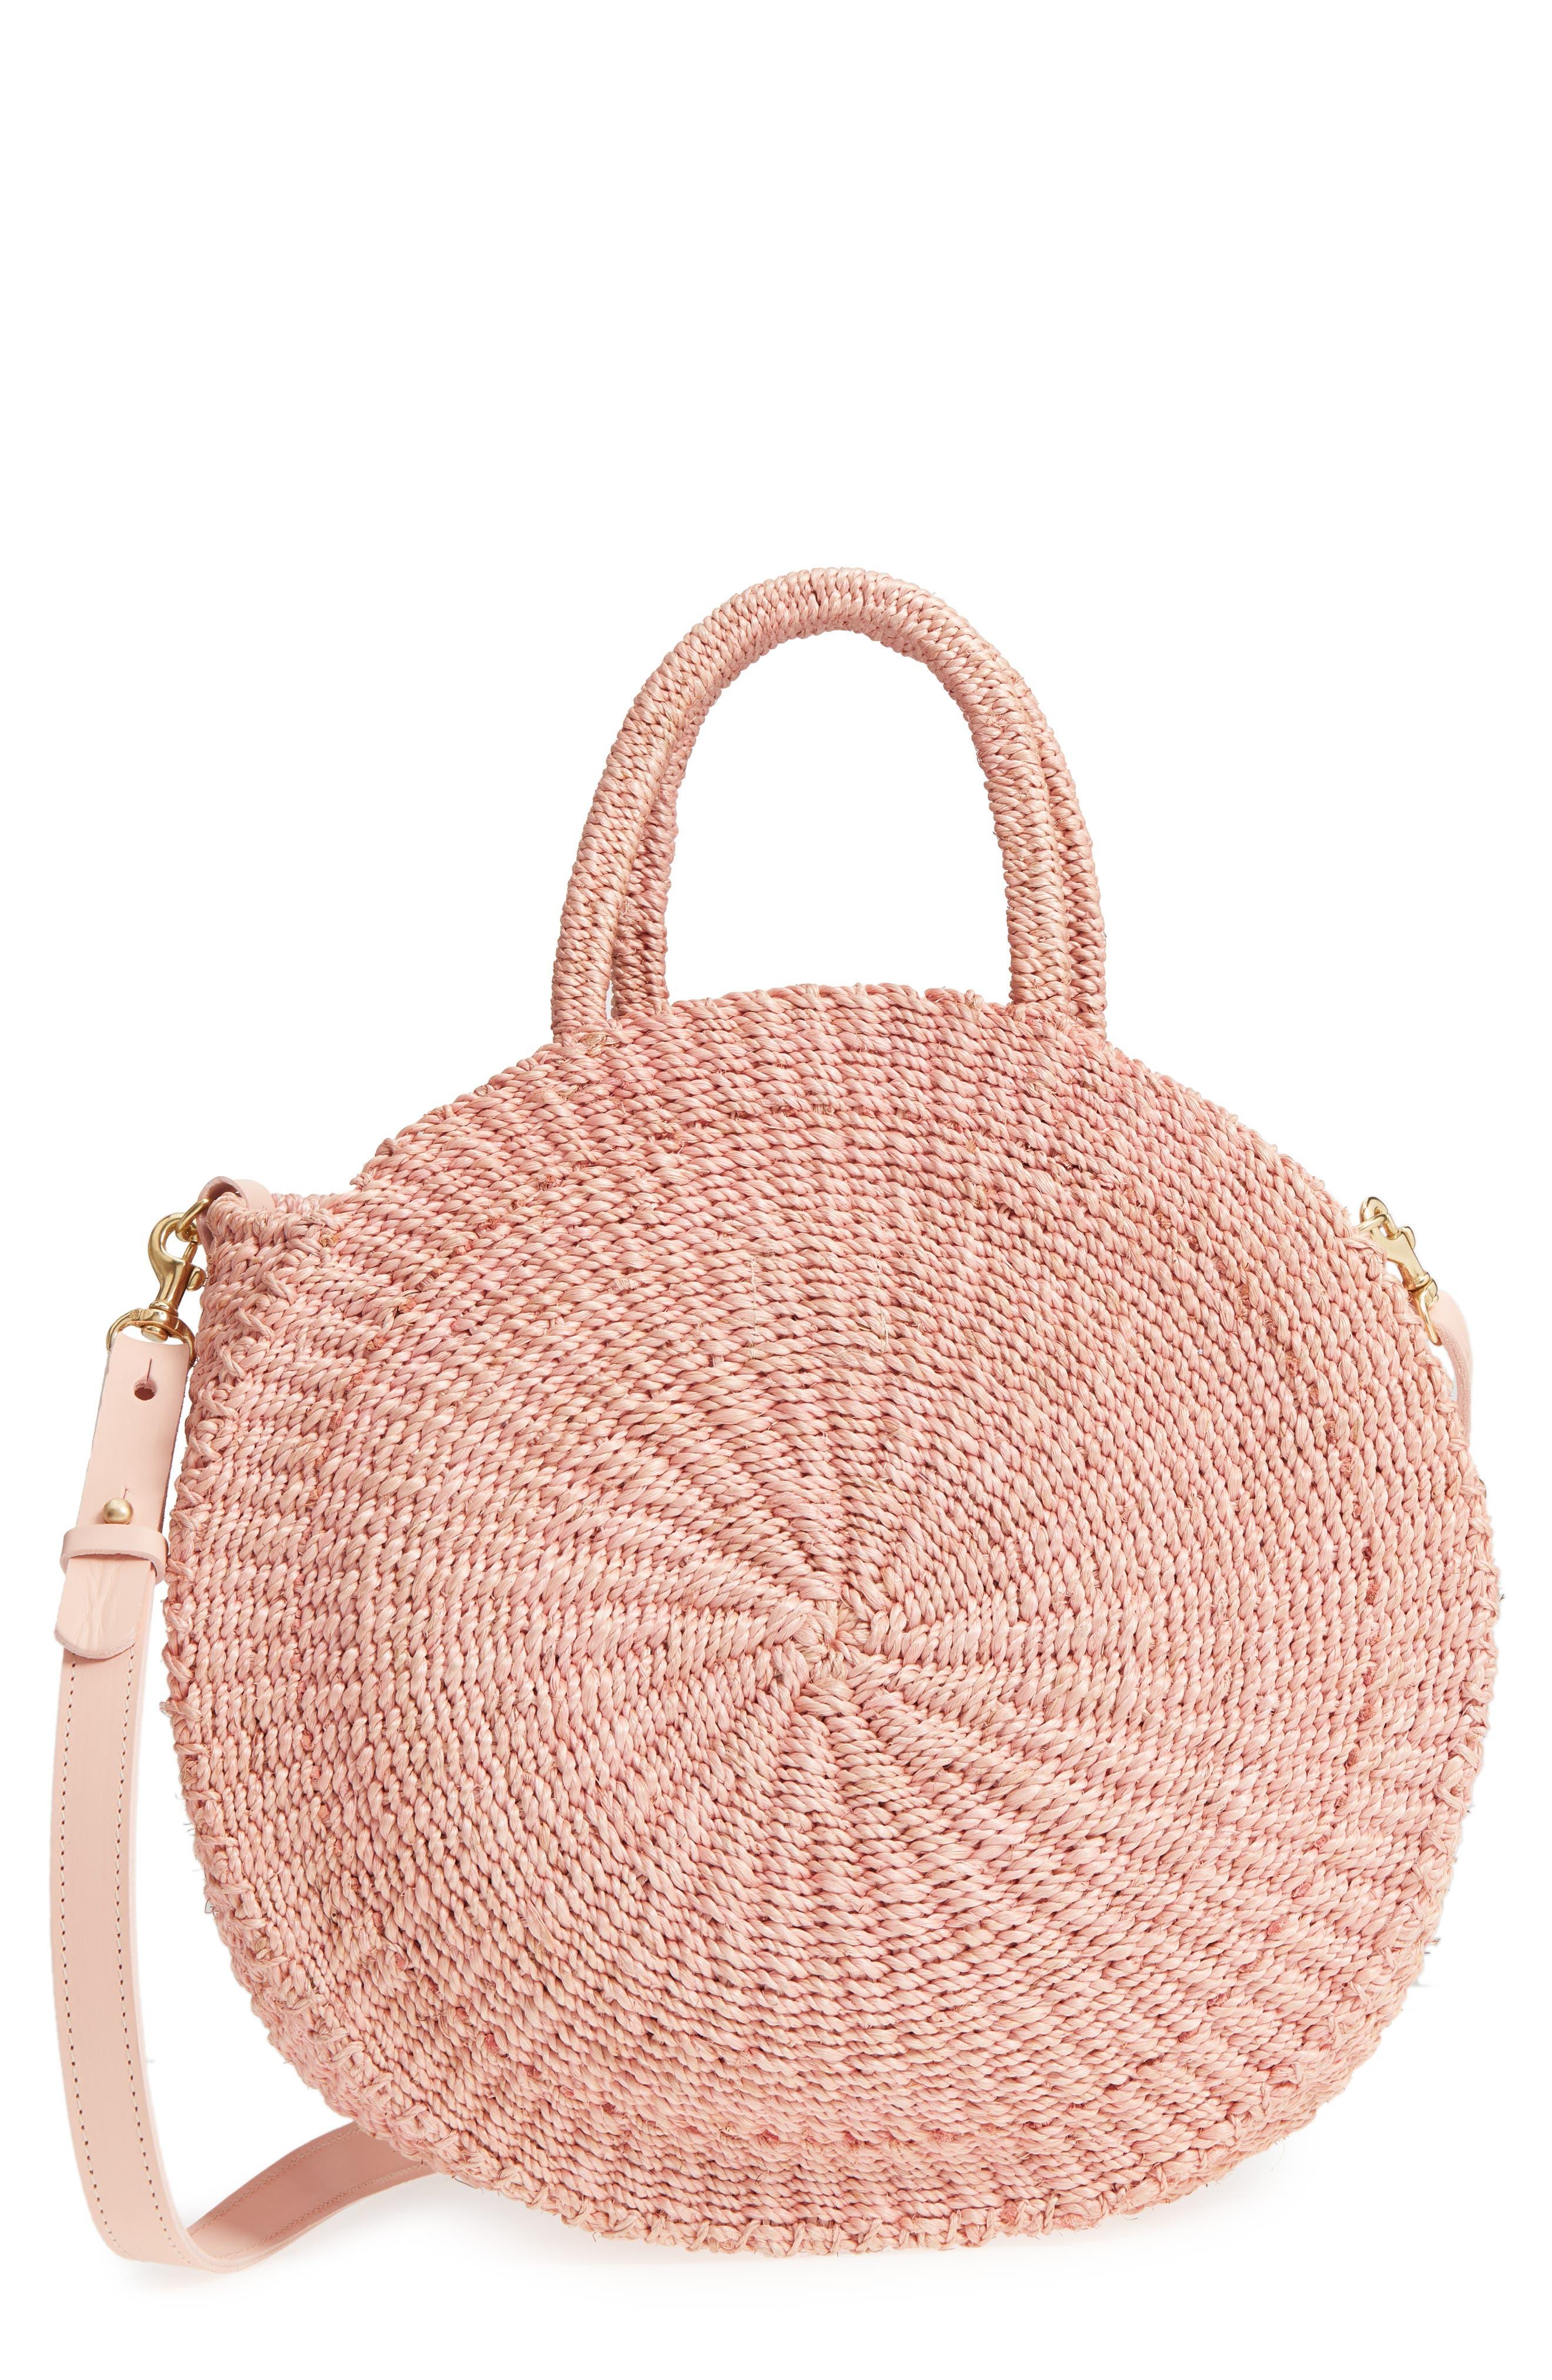 Alice Woven Sisal Straw Bag,                             Main thumbnail 1, color,                             Blush Woven